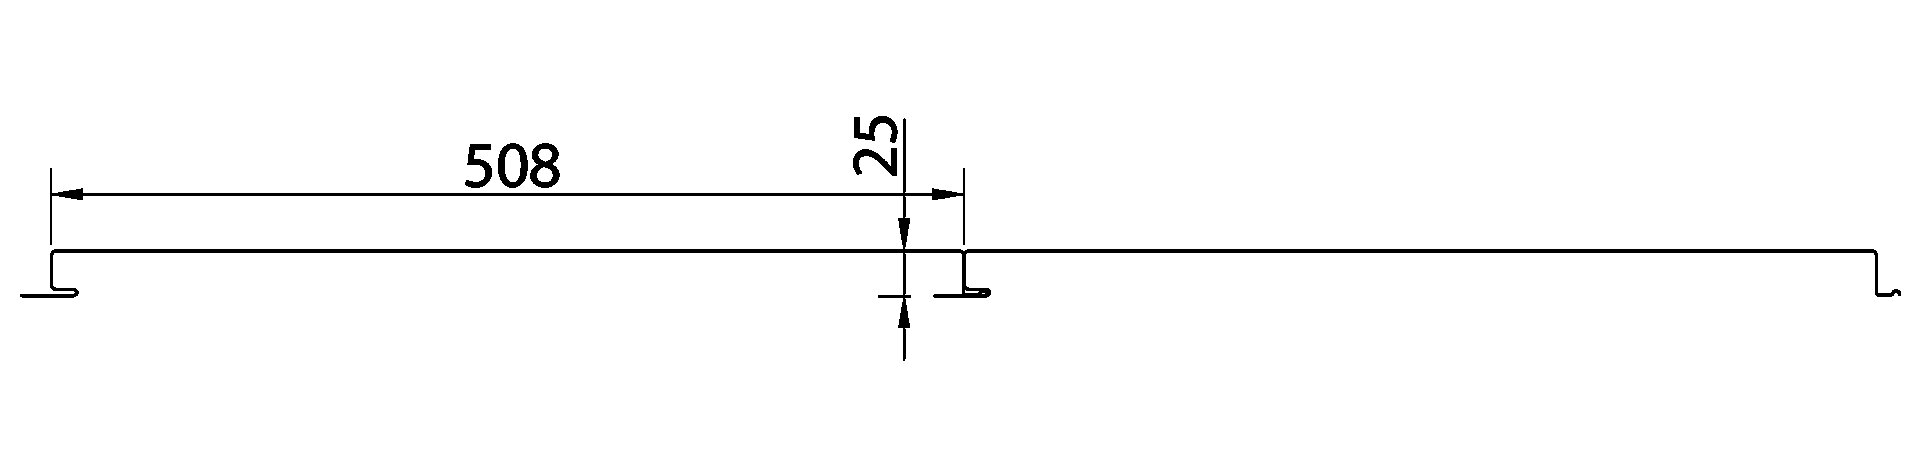 Perfil Cielorraso y Fachada 30 / 50